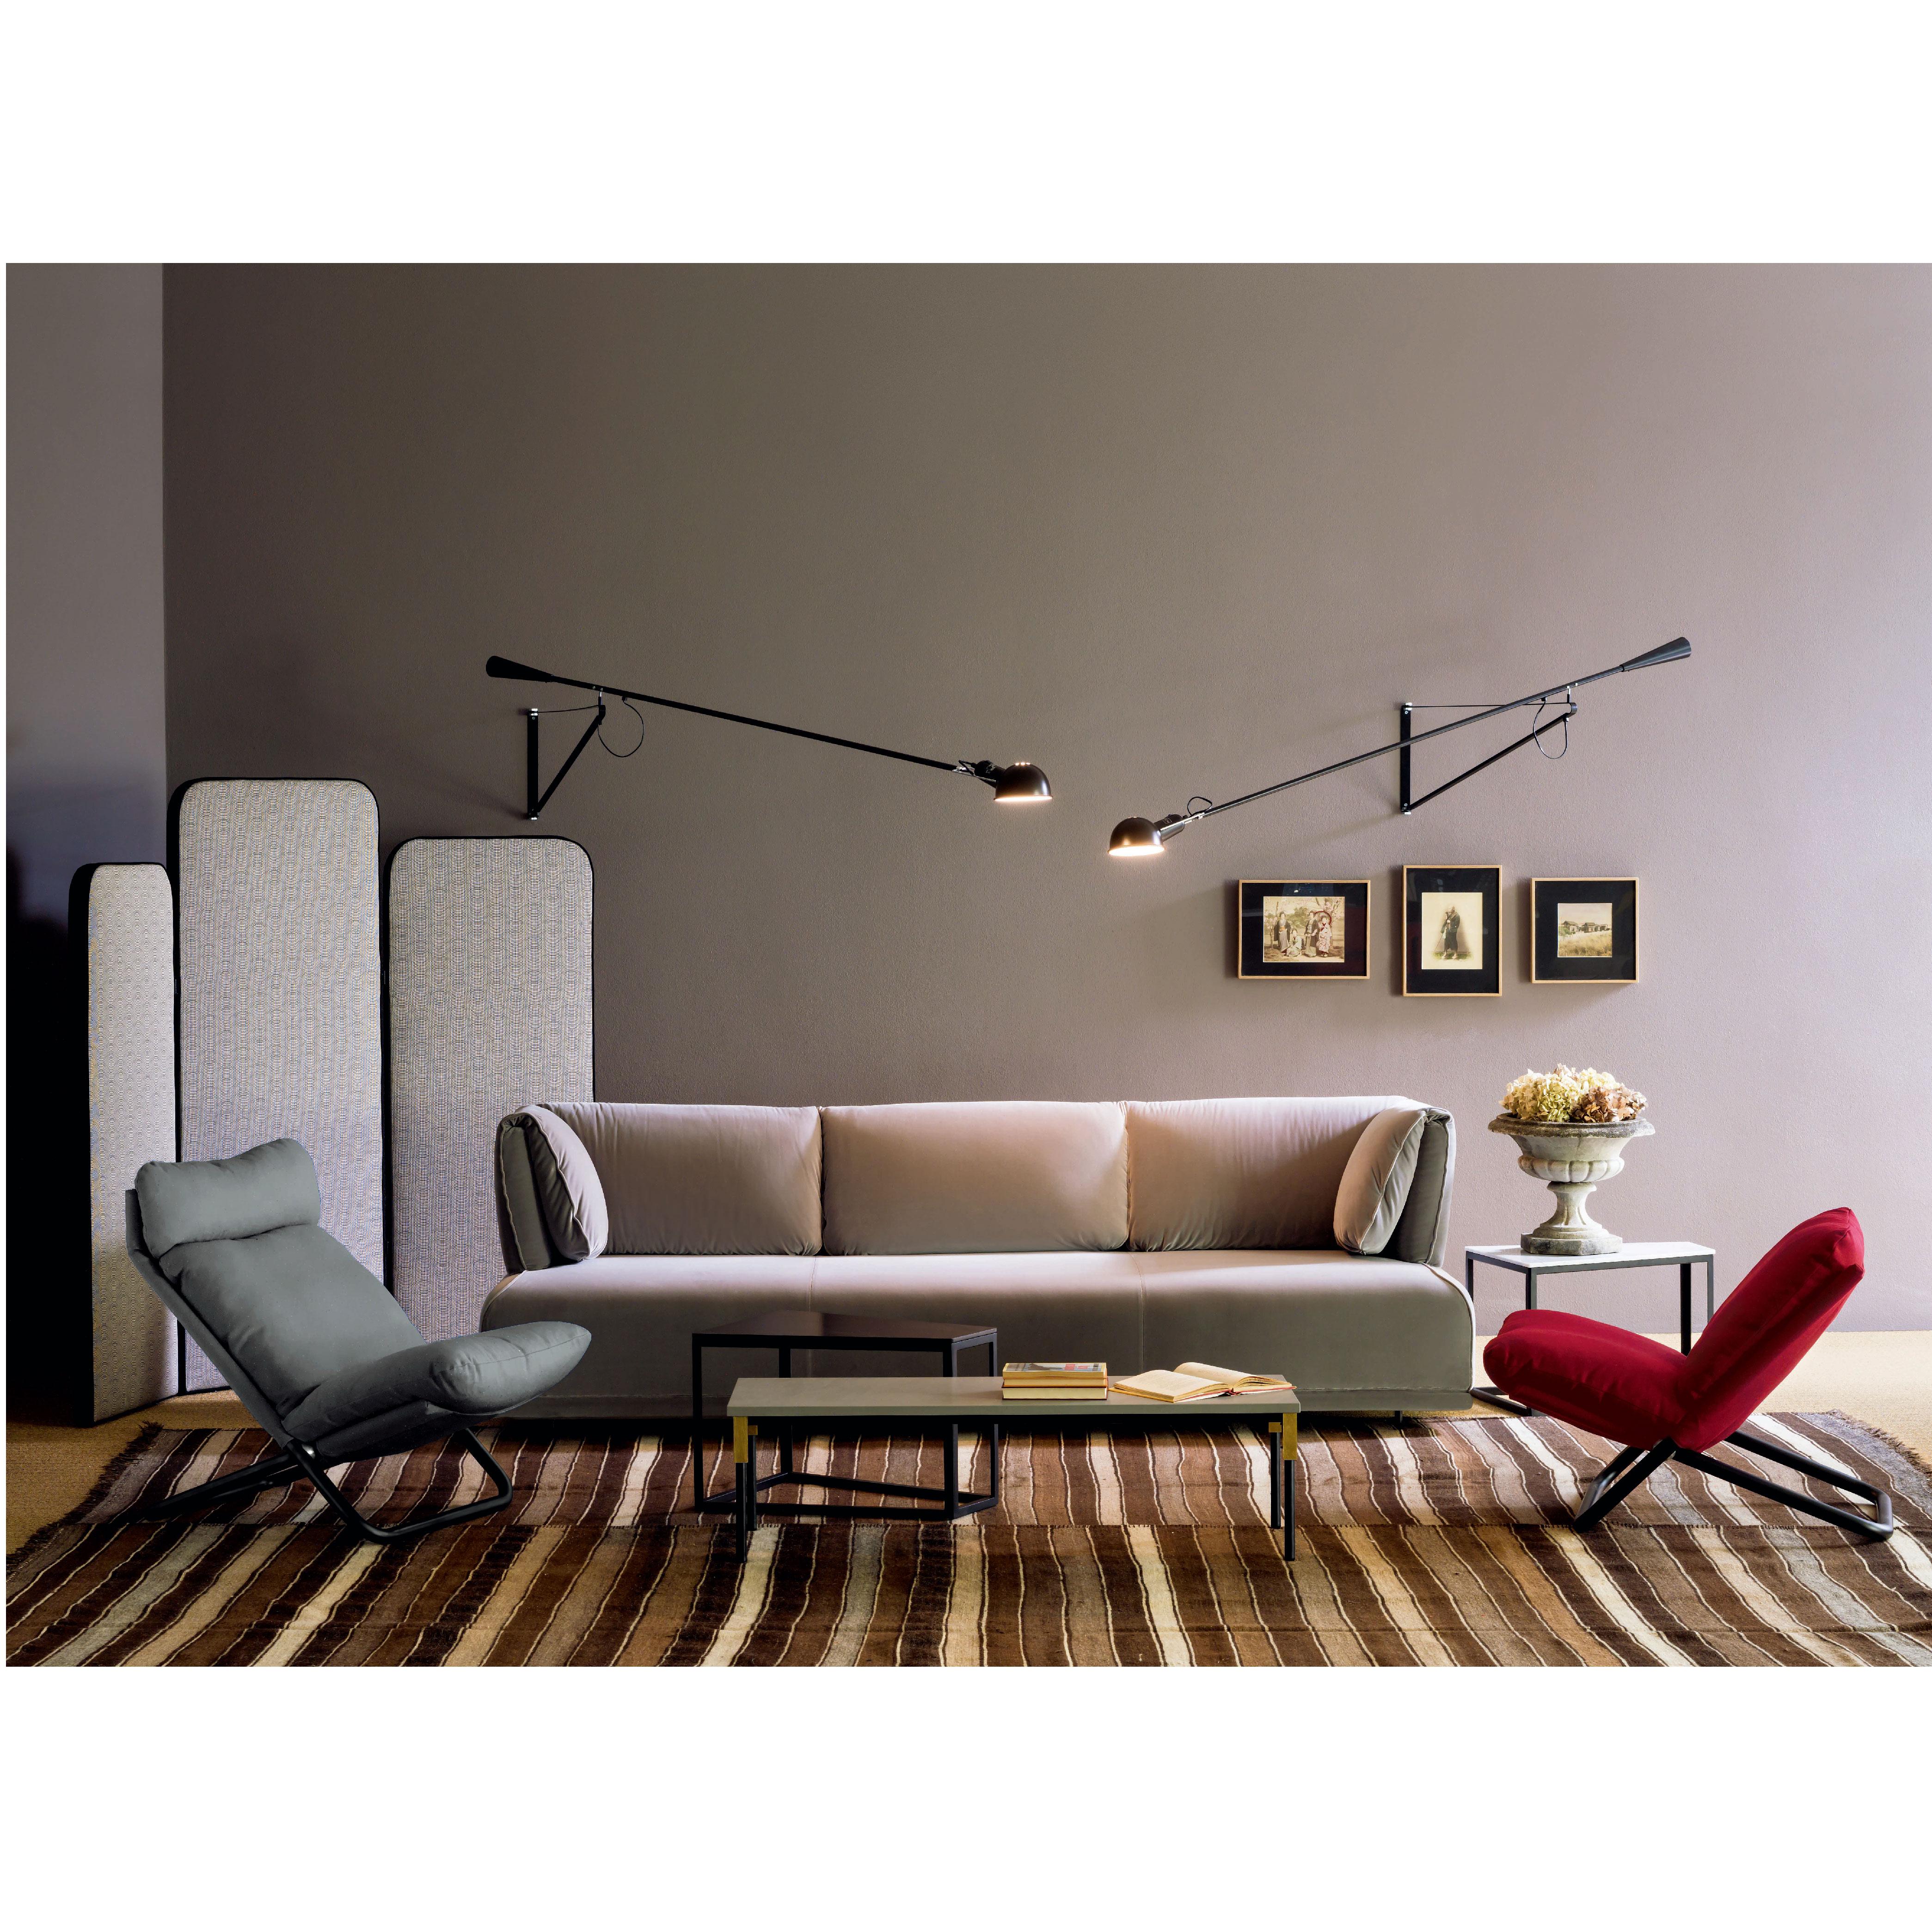 Modern Living Room Furniture Customized White Fabric Soft Big Seat ...